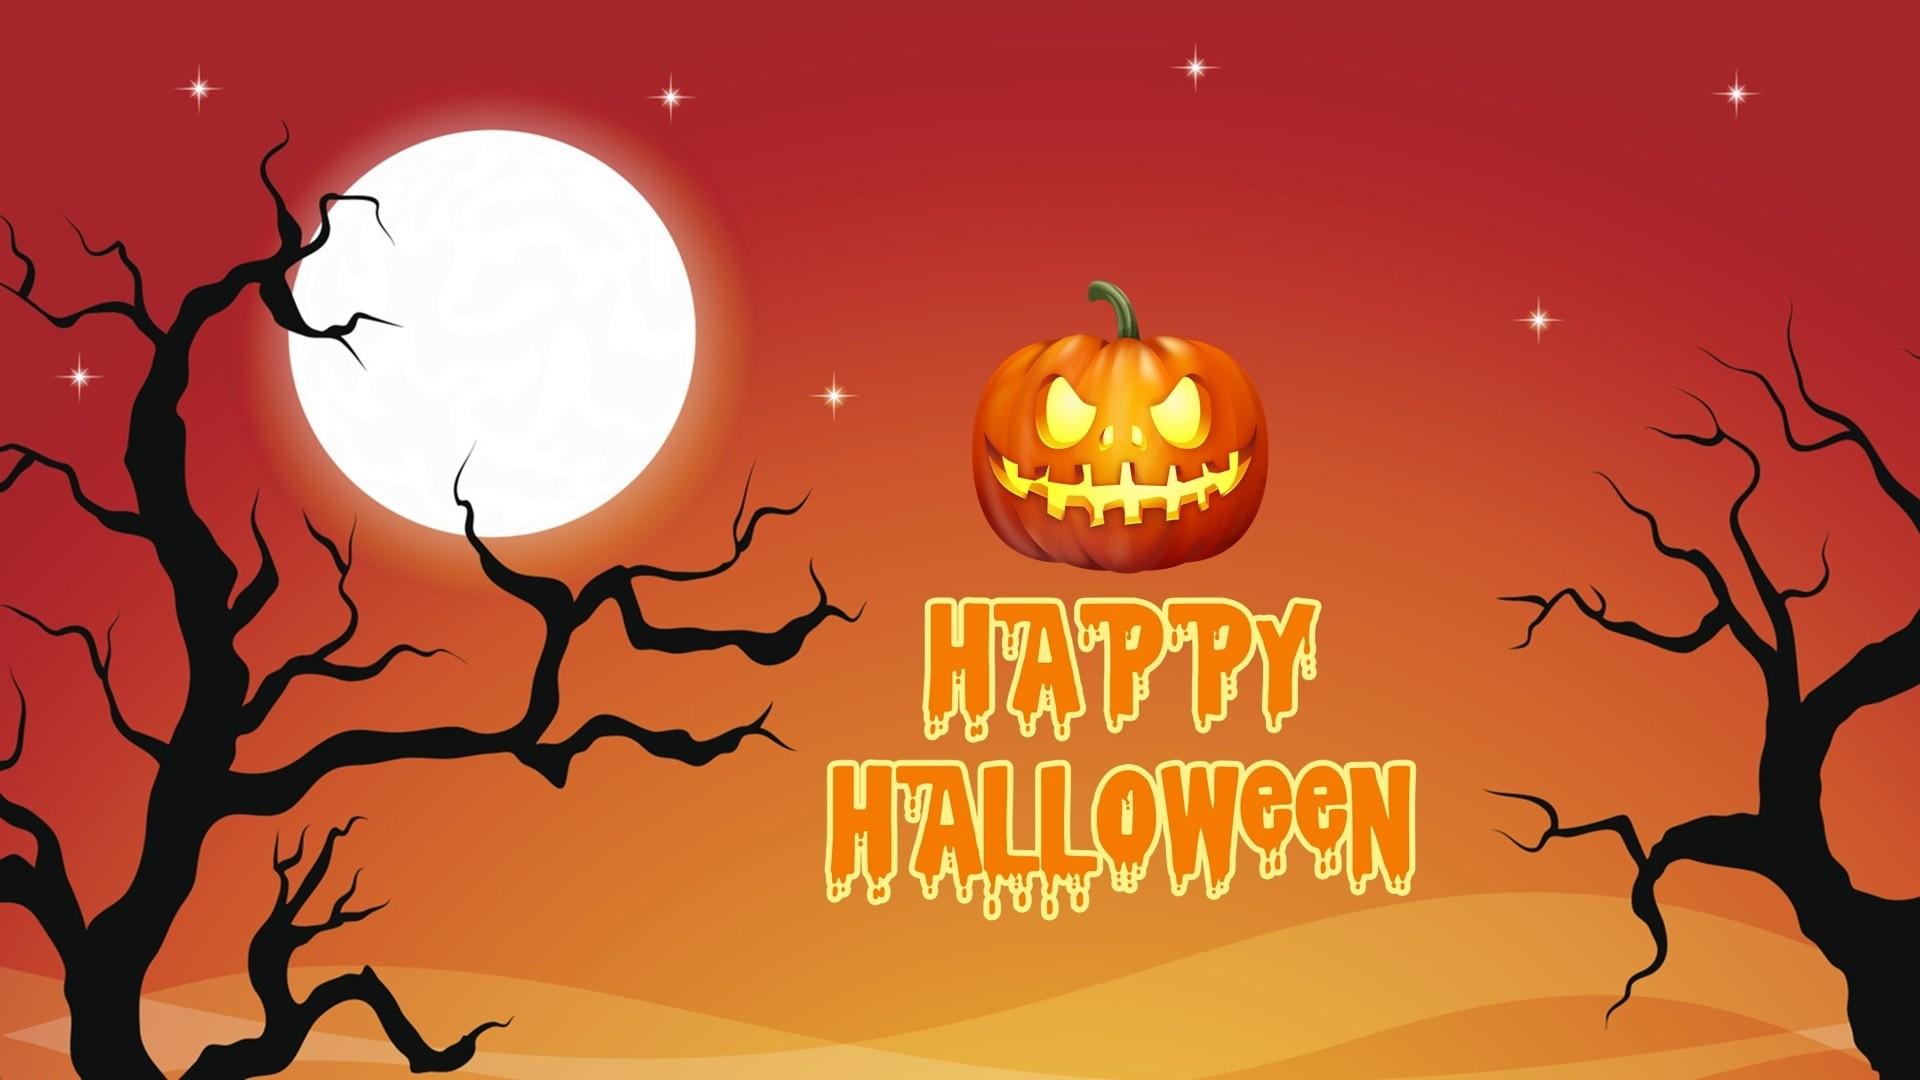 Halloween Greeting Card hd desktop wallpaper